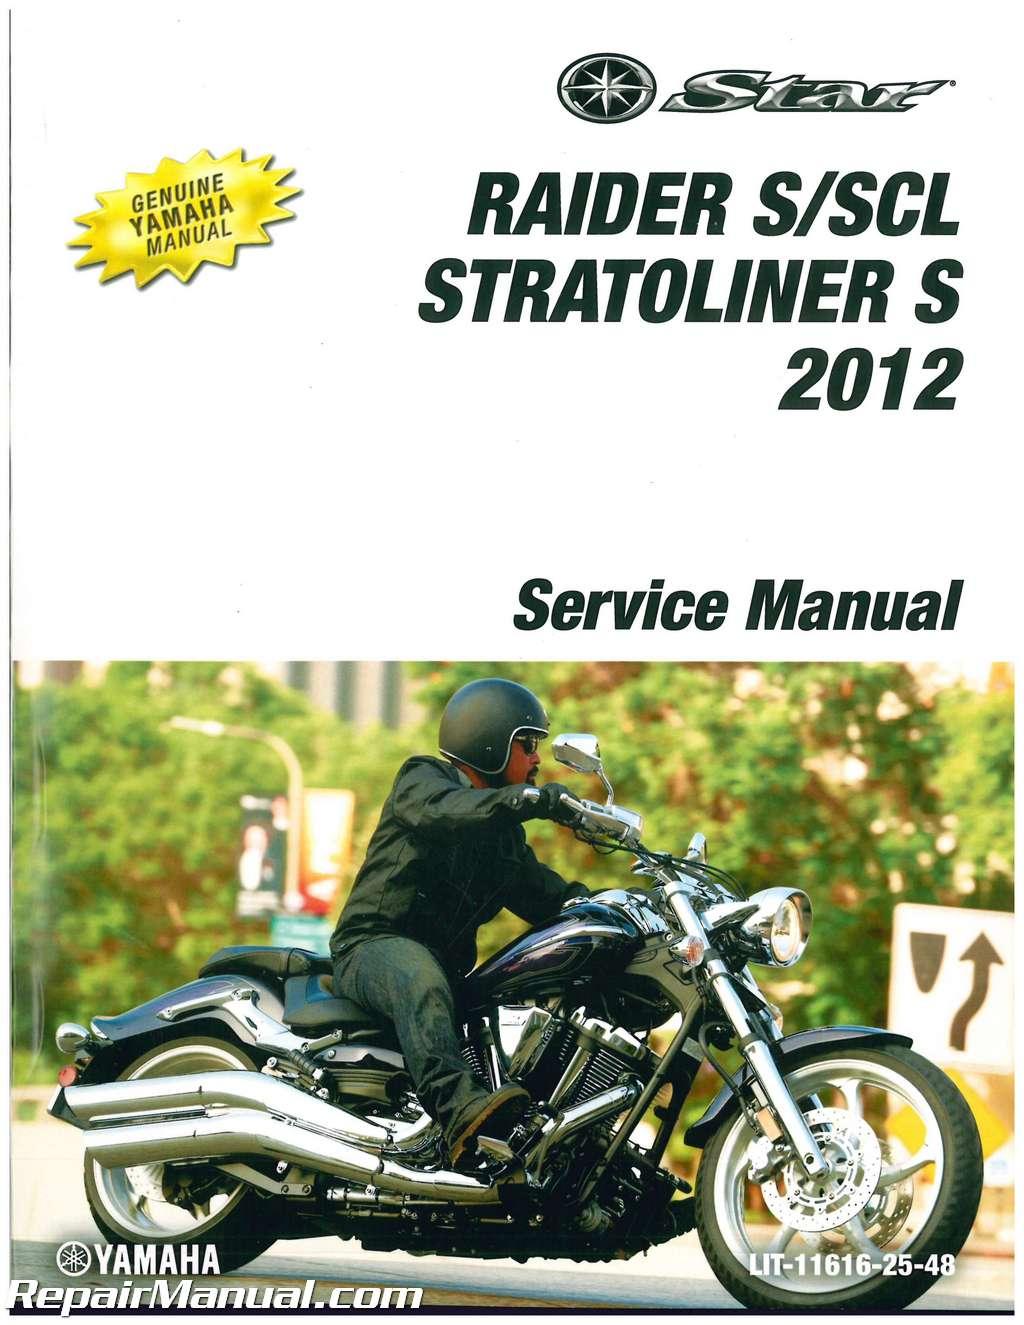 2012 Yamaha XV19 Raider Roadliner S Stratoliner S Motorcycle Service Manual